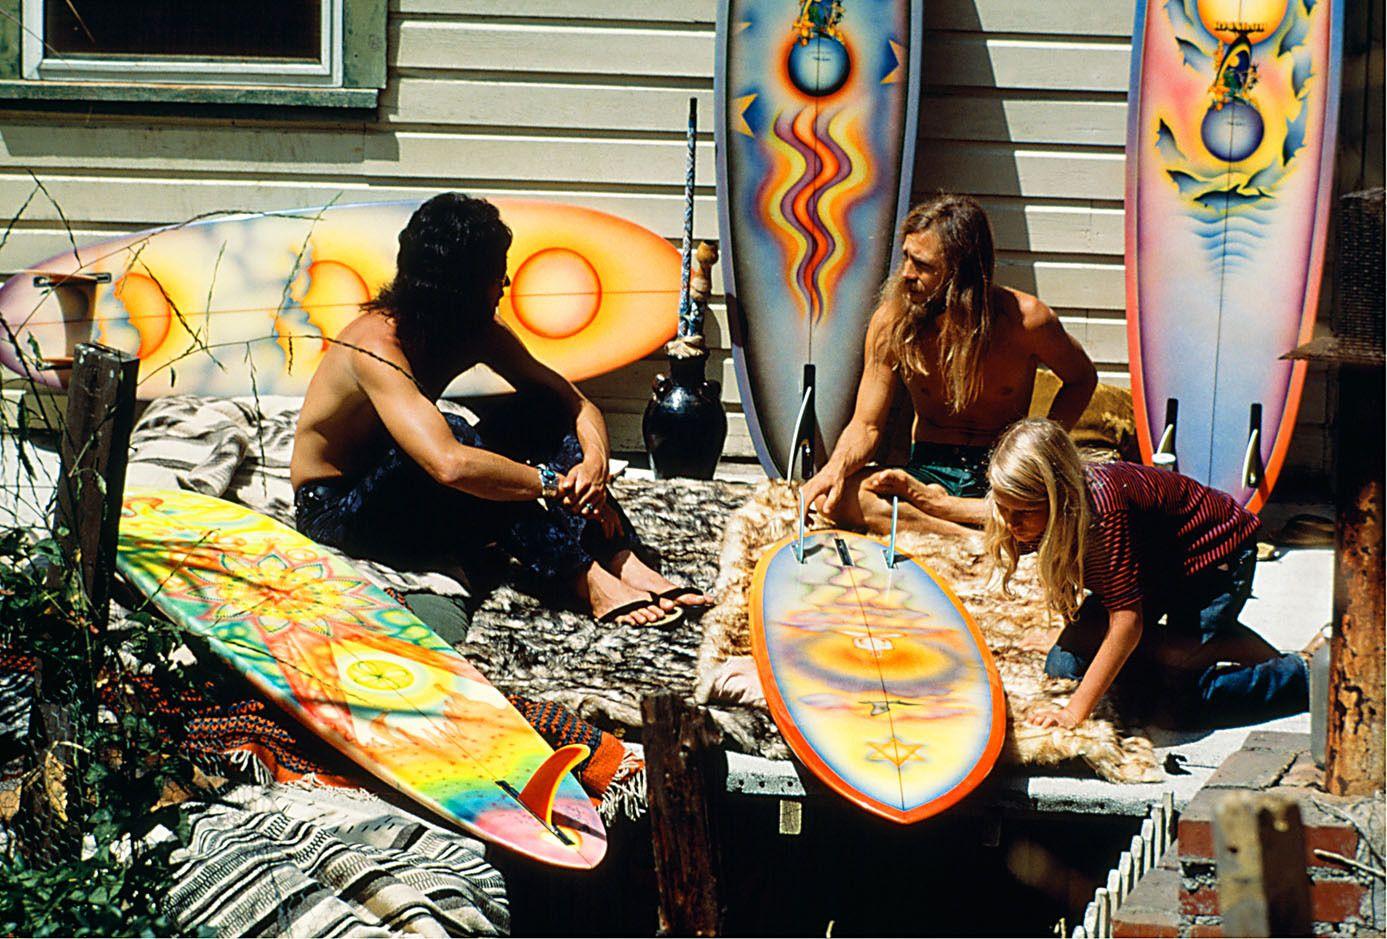 BROTHERHOOD OF ETERNAL LOVE, CANYON ACRES, LAGUNA CANYON. 1971